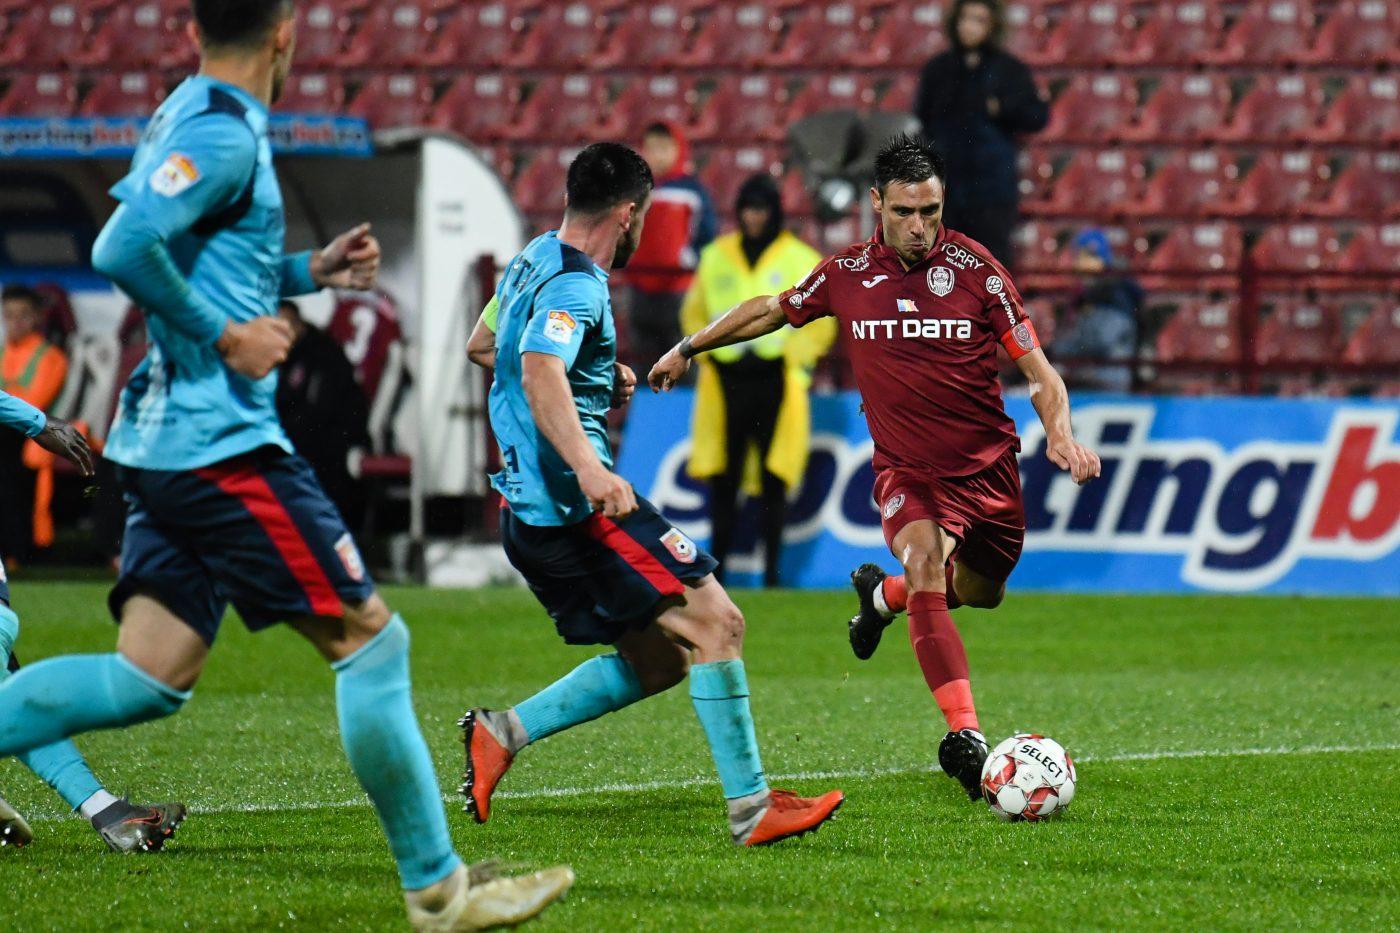 Ziua de Cluj   Unde se joacă meciul CFR Cluj - Chindia din ...   Cfr Cluj- Chindia Târgoviște